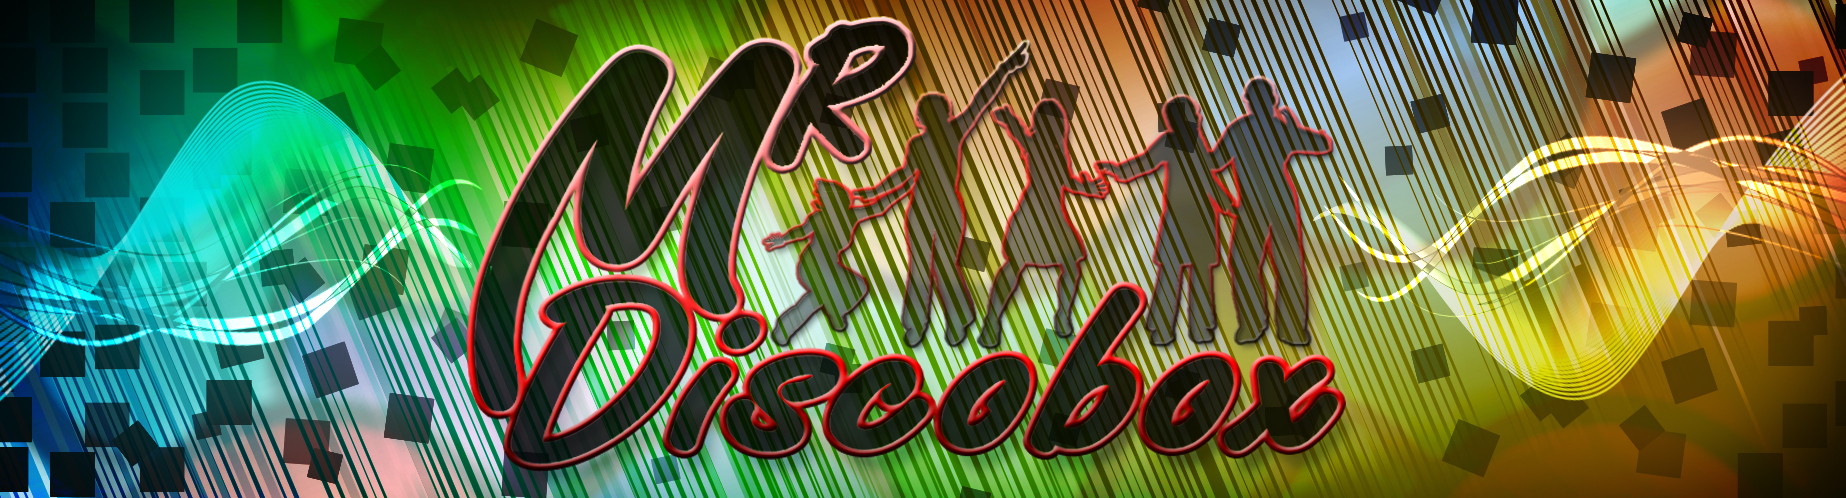 d(0_o)b  Disko B & Coleen Genesis  d(o_0)b